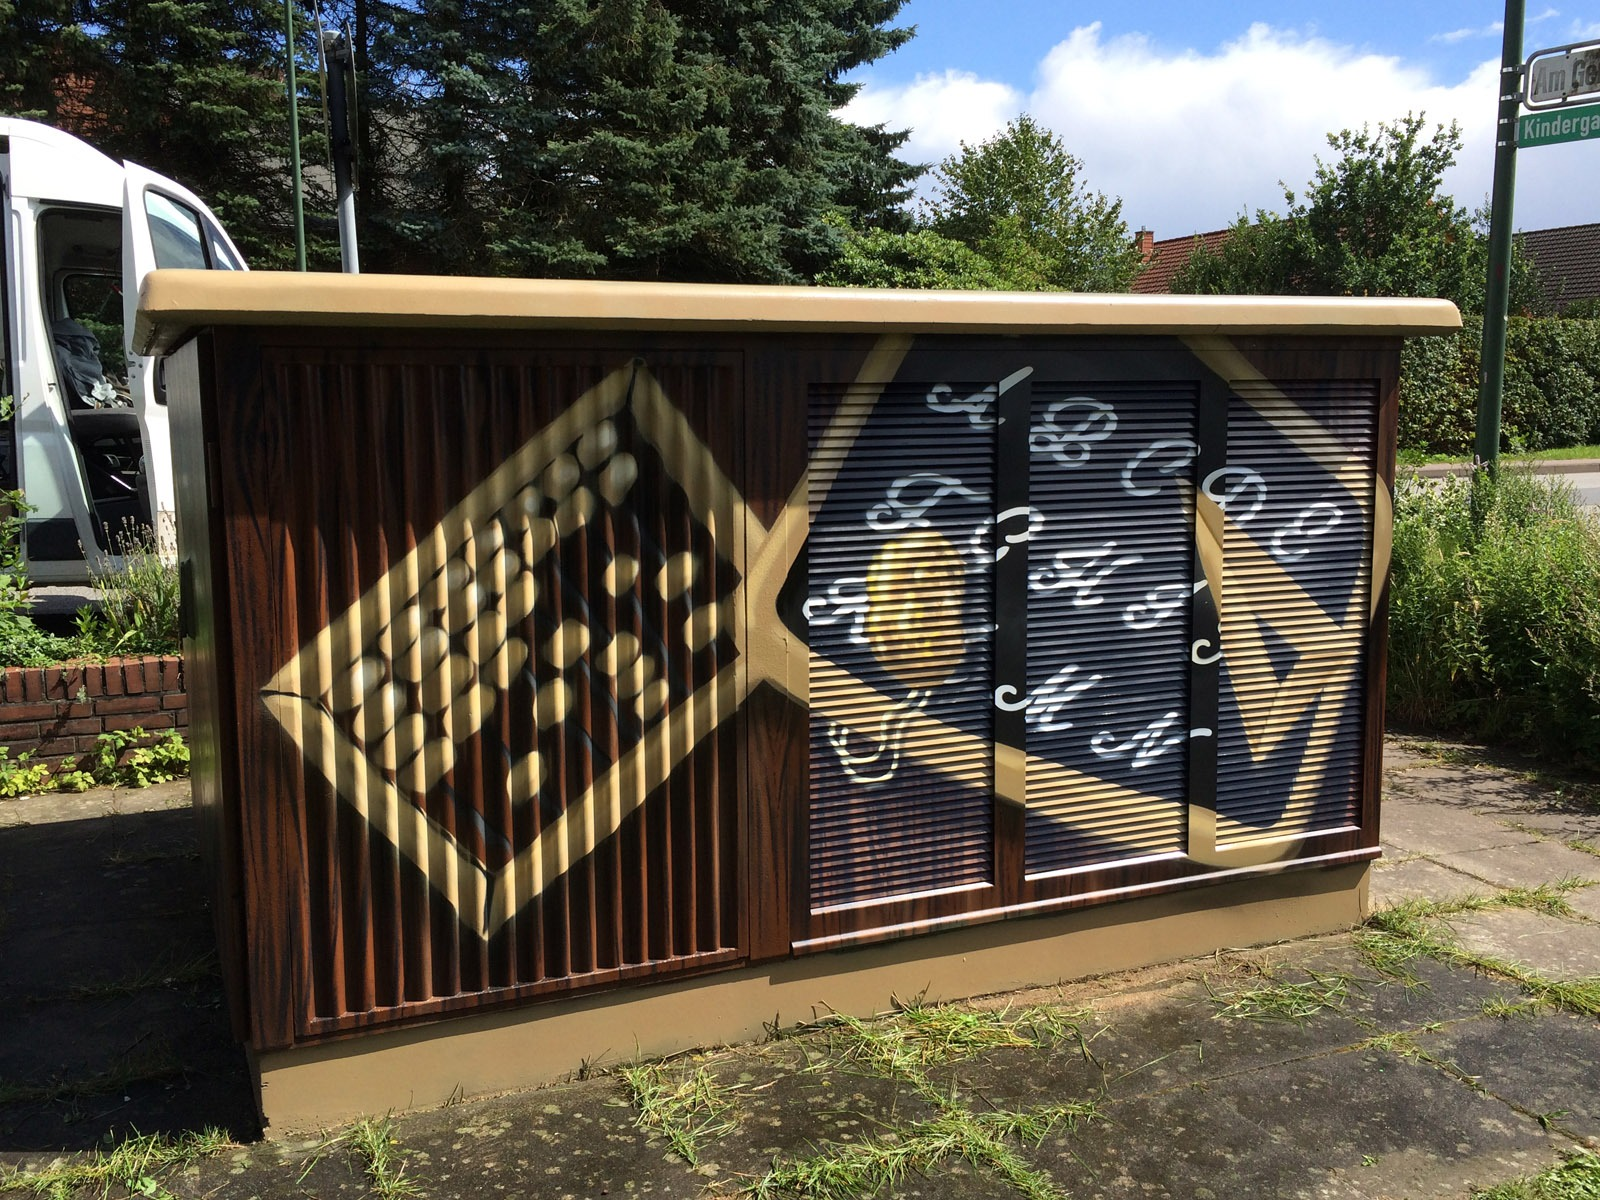 graffitiauftrag-graffitikuenstler-artmos4-hansewerk-2016-holz-schule-schrift-braun-beige-fotorealistisch-aussen-energieversorger